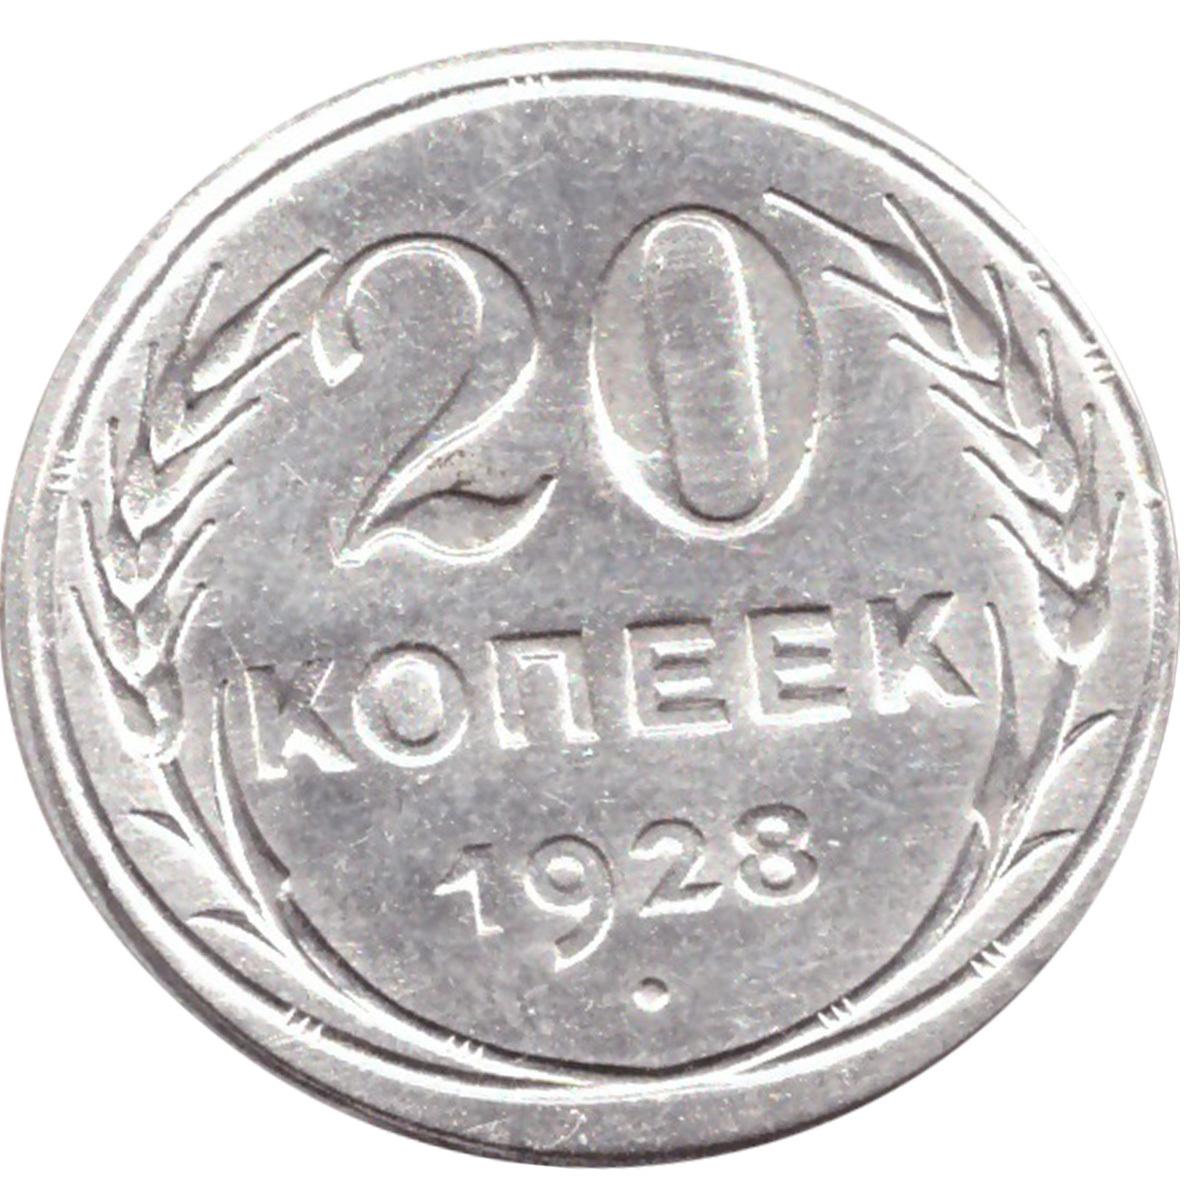 20 копеек 1928 г. СССР. XF